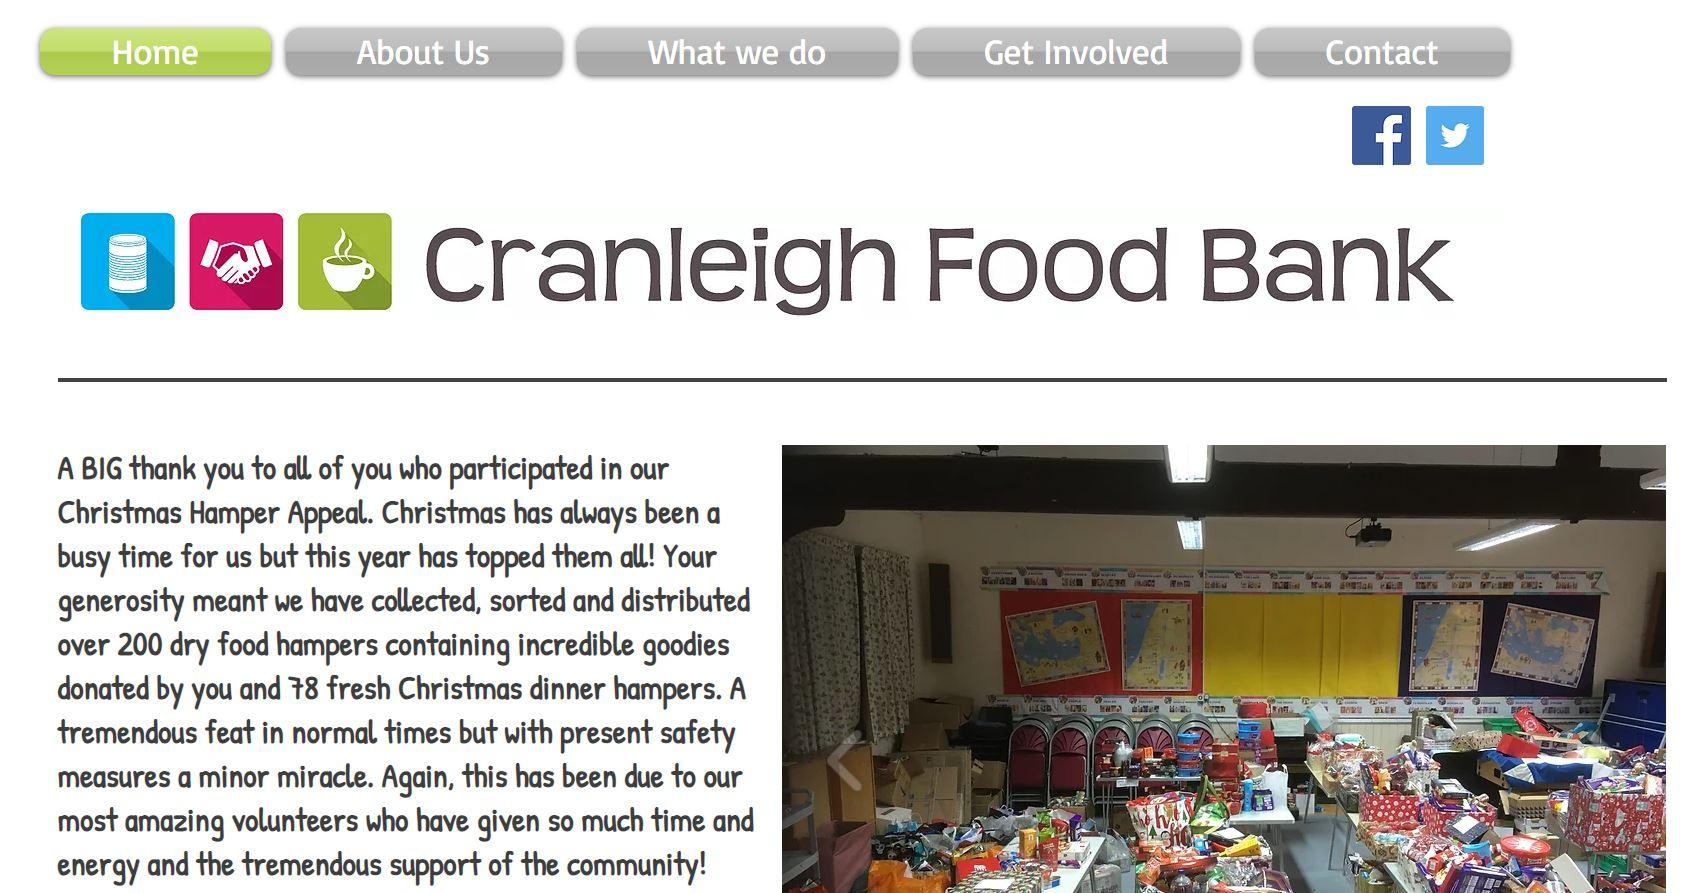 Cranleigh Food Bank